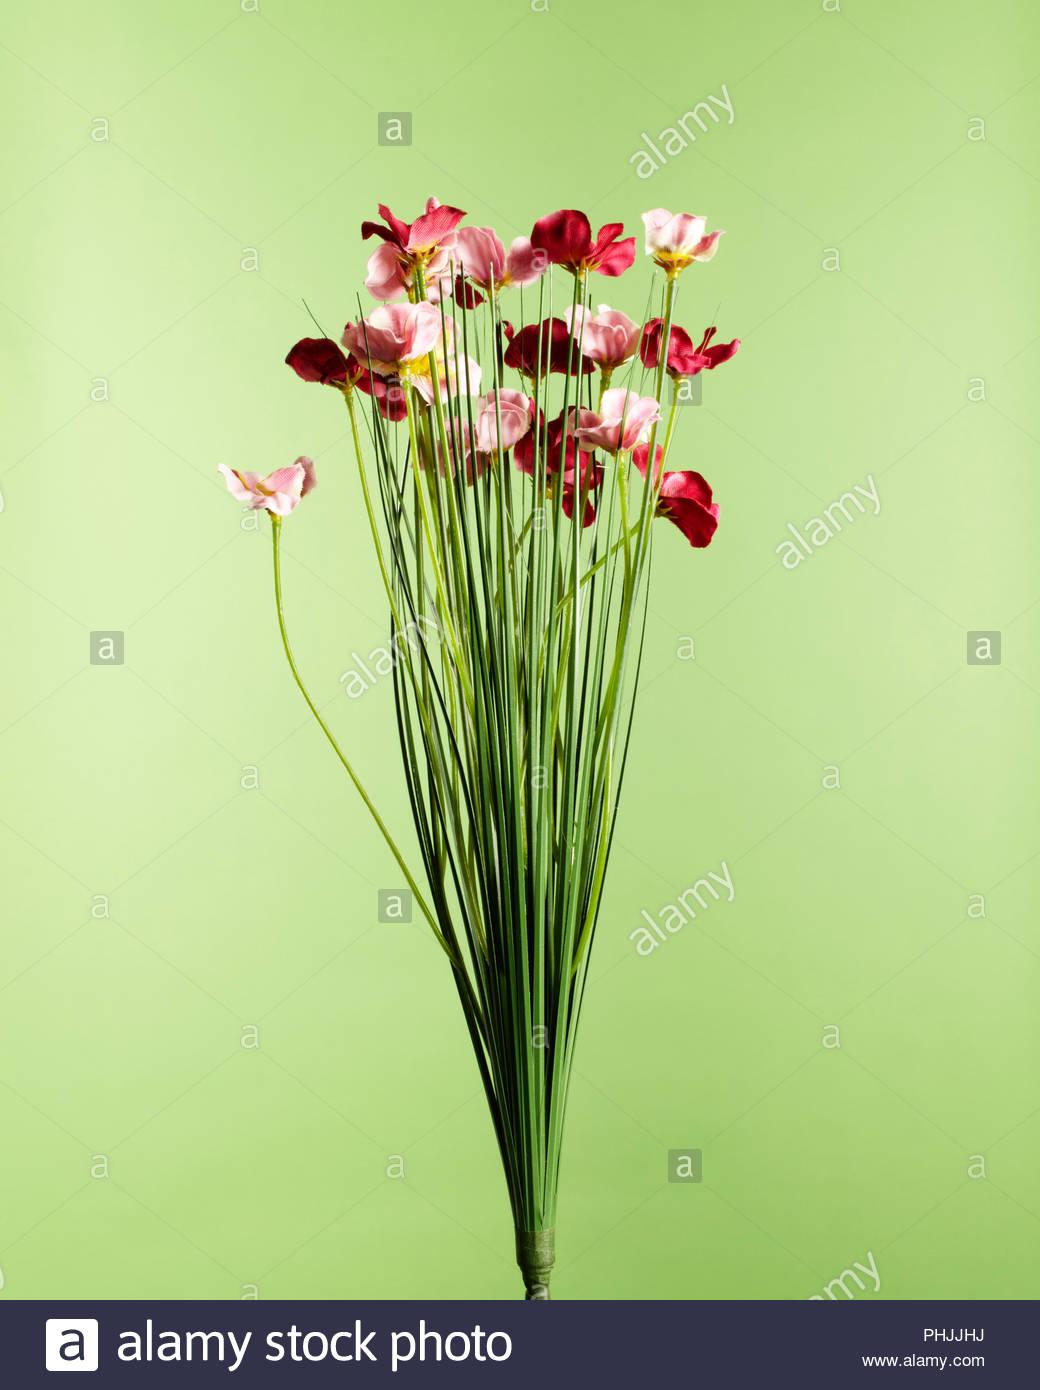 Rosa und rote Blüten Stockbild